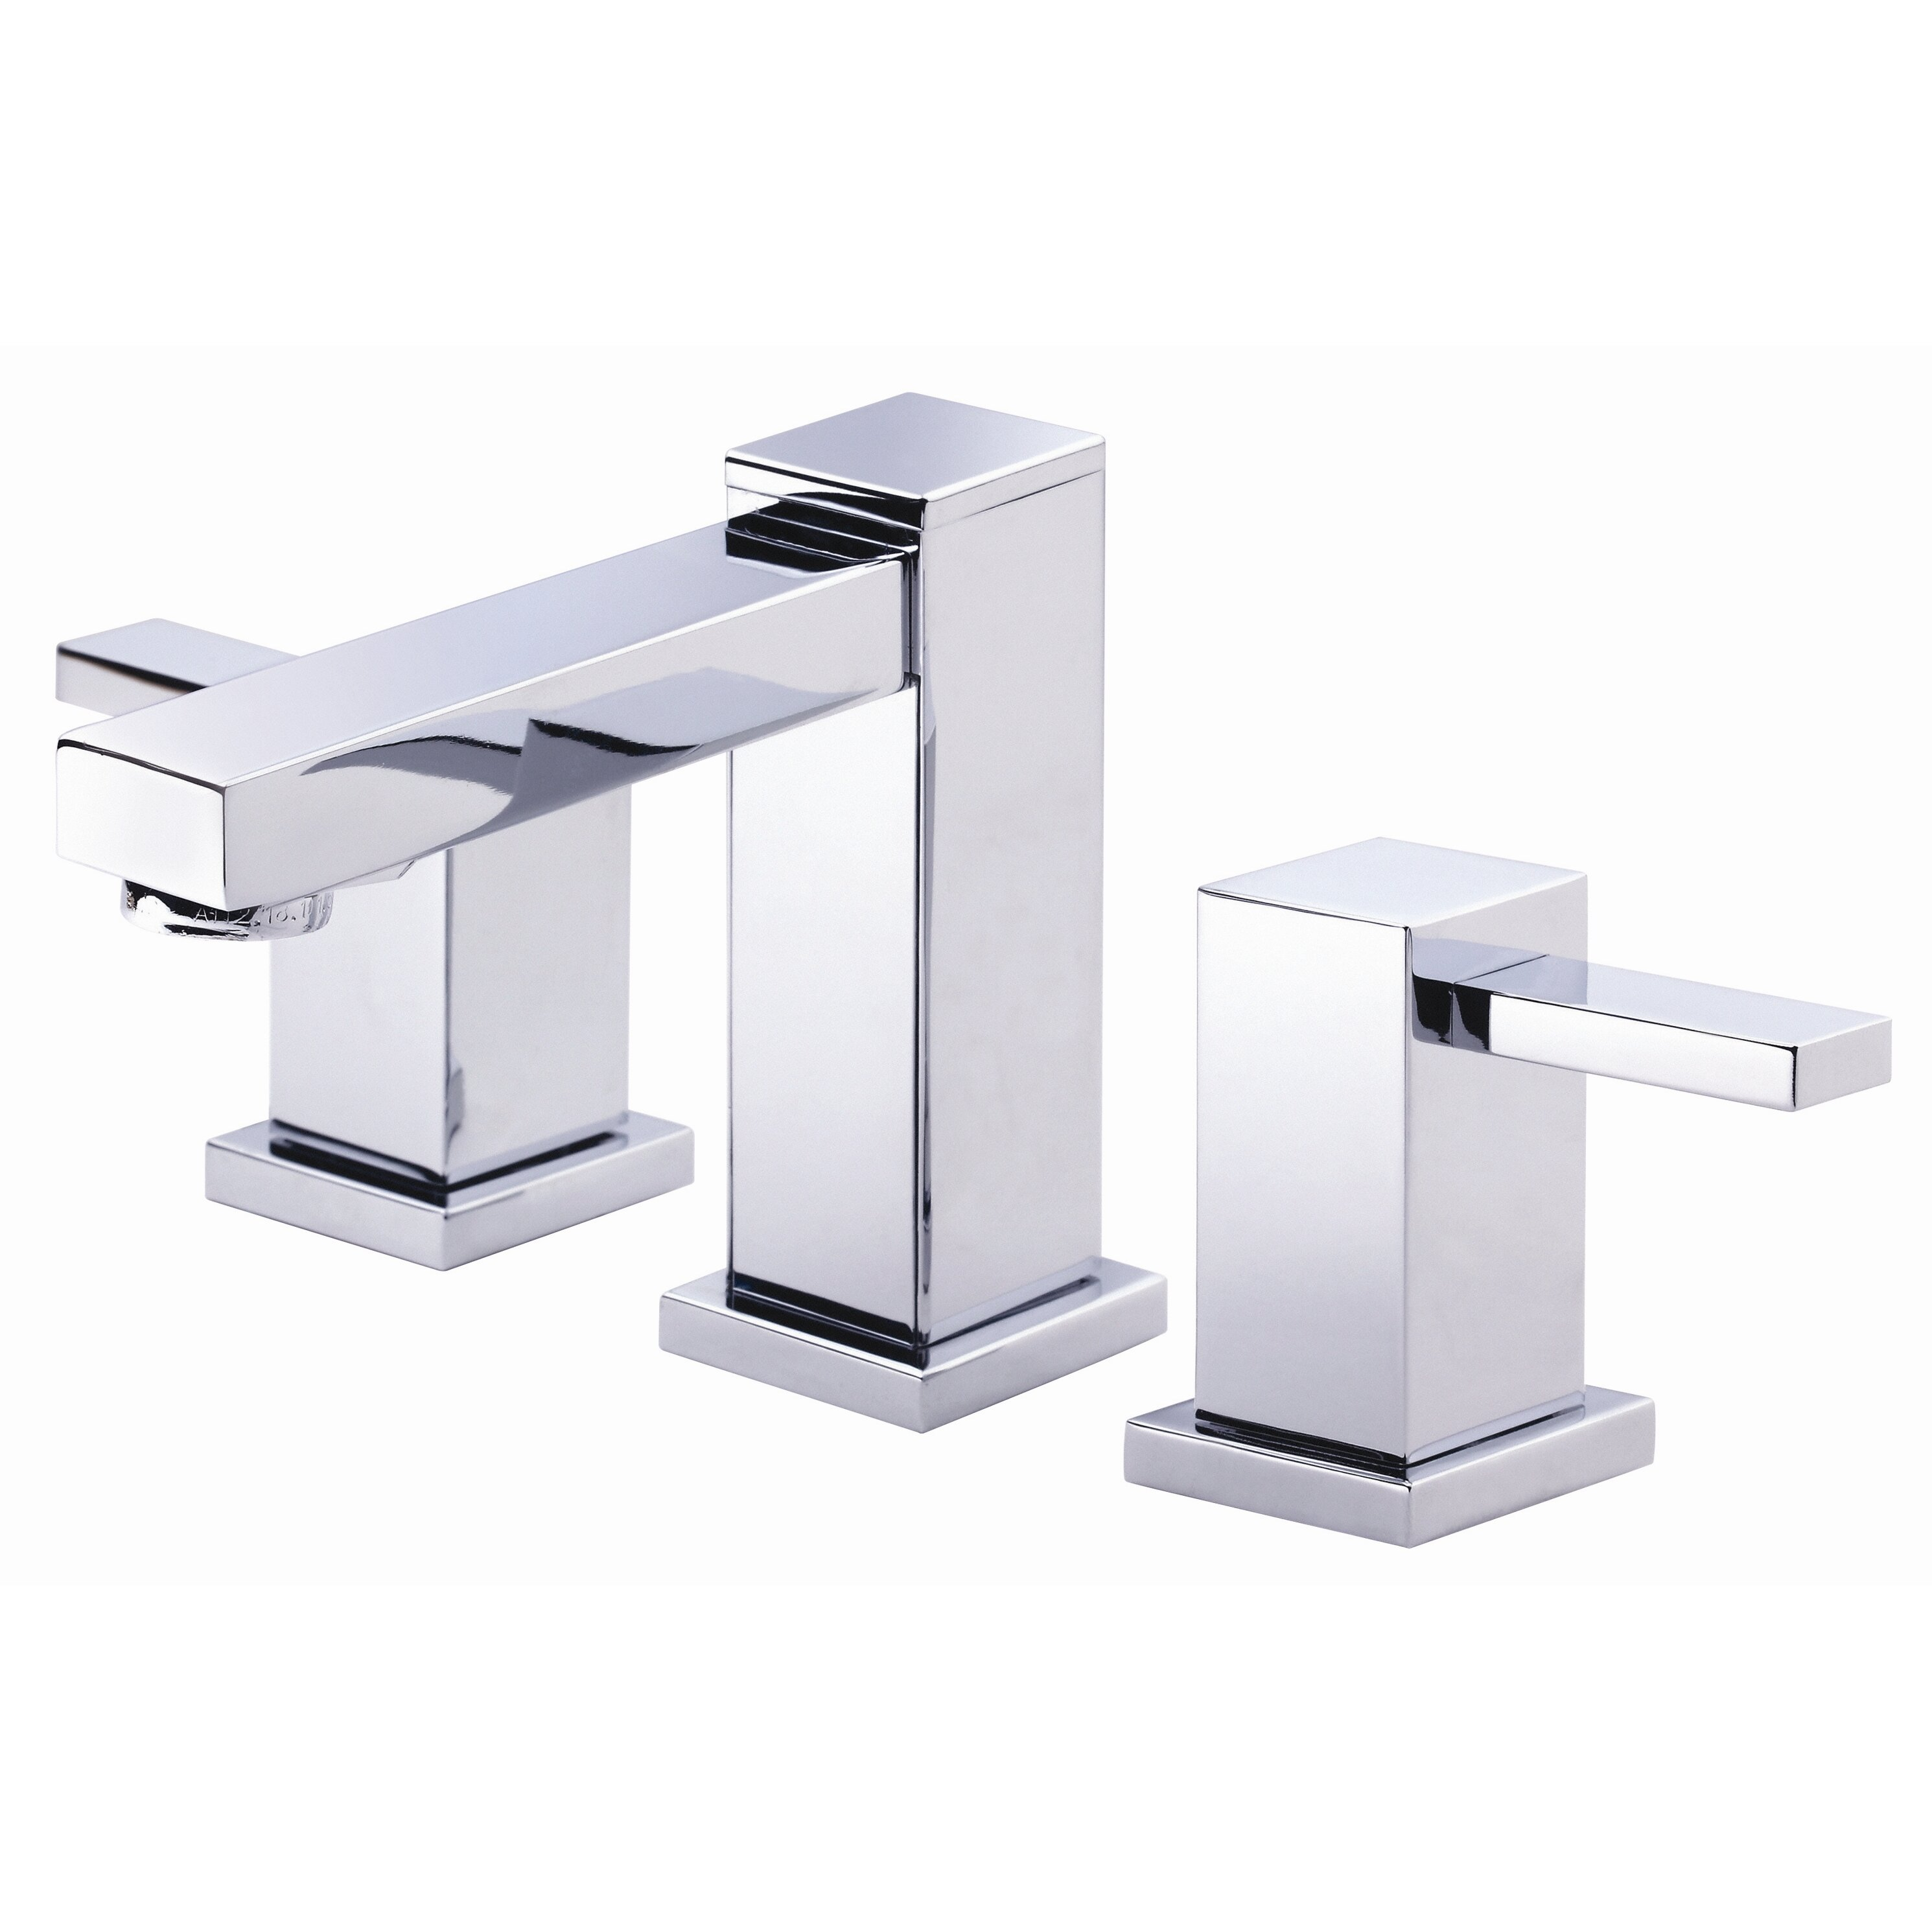 Danze reg  Reef Double Handle Mini Widespread Bathroom Faucet. Danze Reef Double Handle Mini Widespread Bathroom Faucet   Reviews